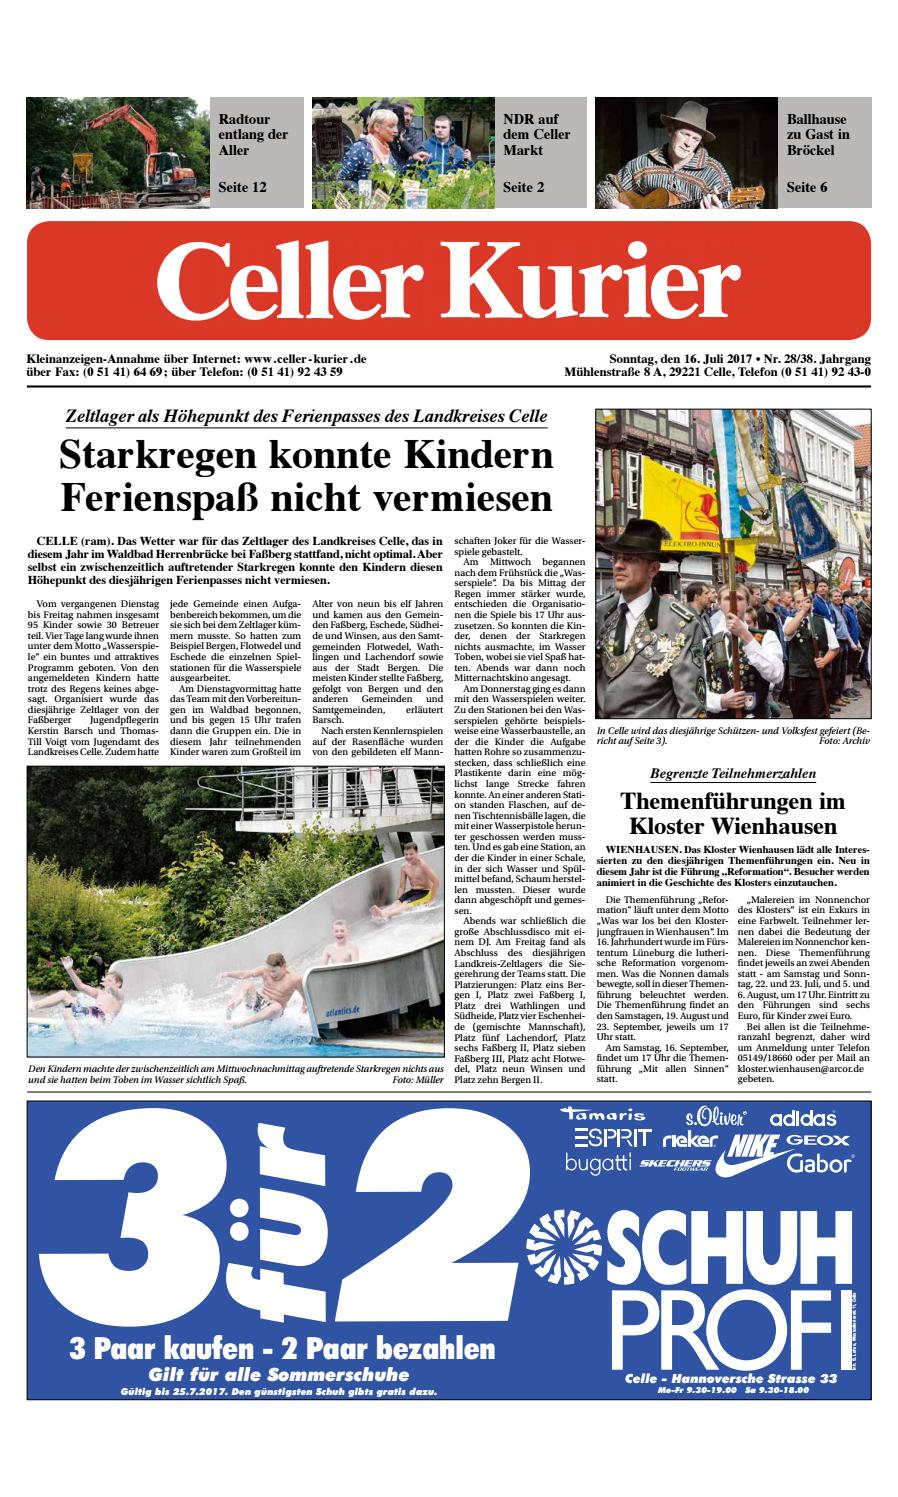 KW12 Celler Kurier Ausgabe Sonntag by Celler Kurier - issuu